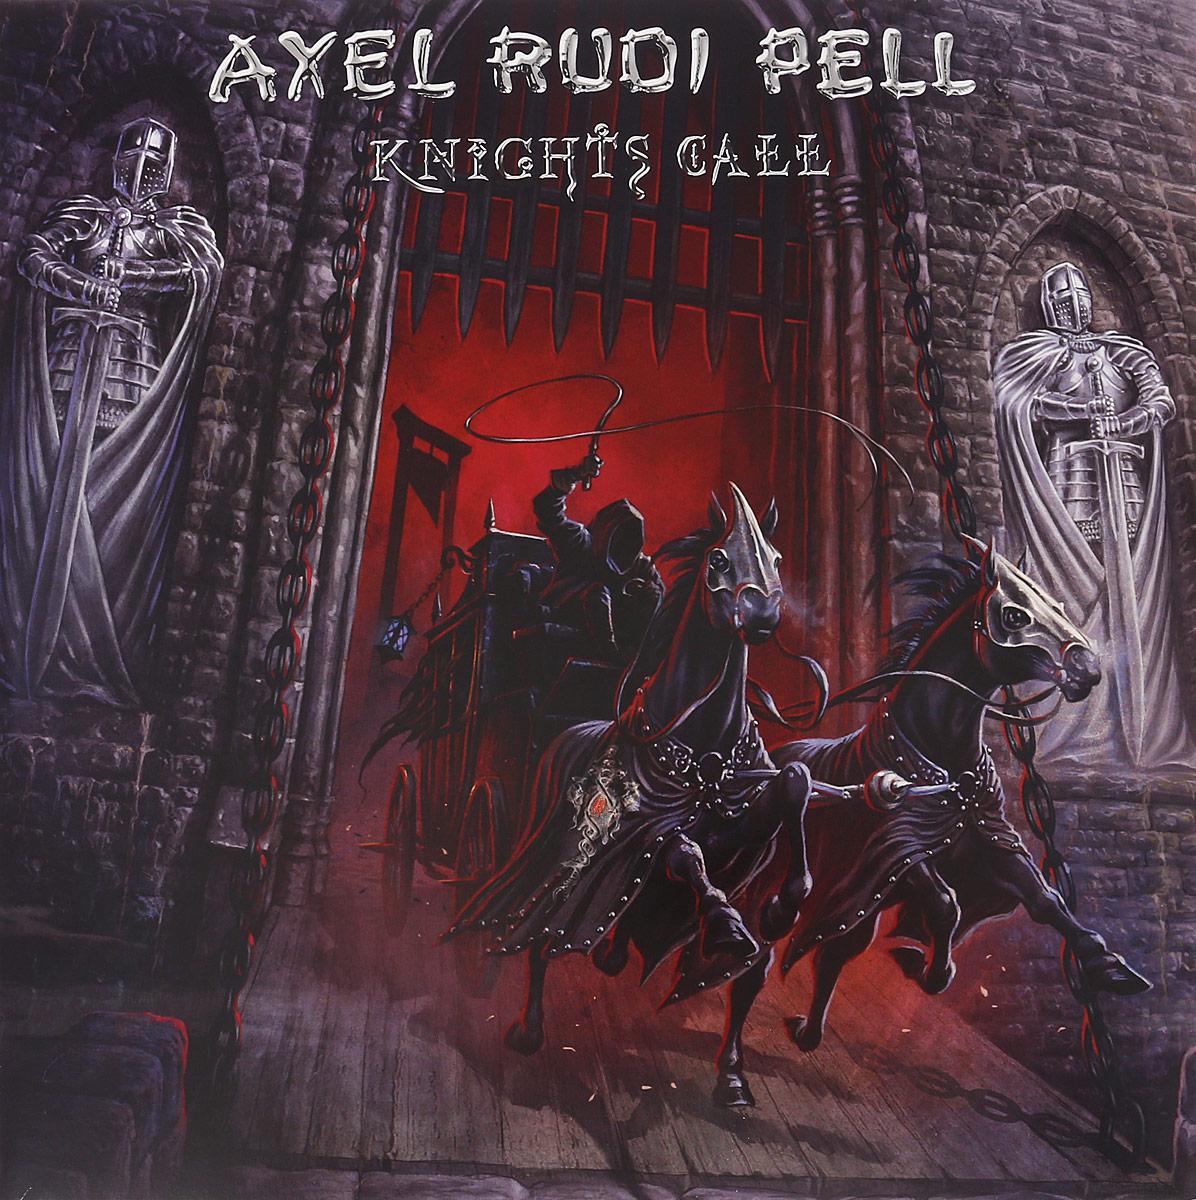 Аксель Руди Пелл Axel Rudi Pell. Knights Call (2 LP) аксель руди пелл axel rudi pell shadow zone re release 2lp cd